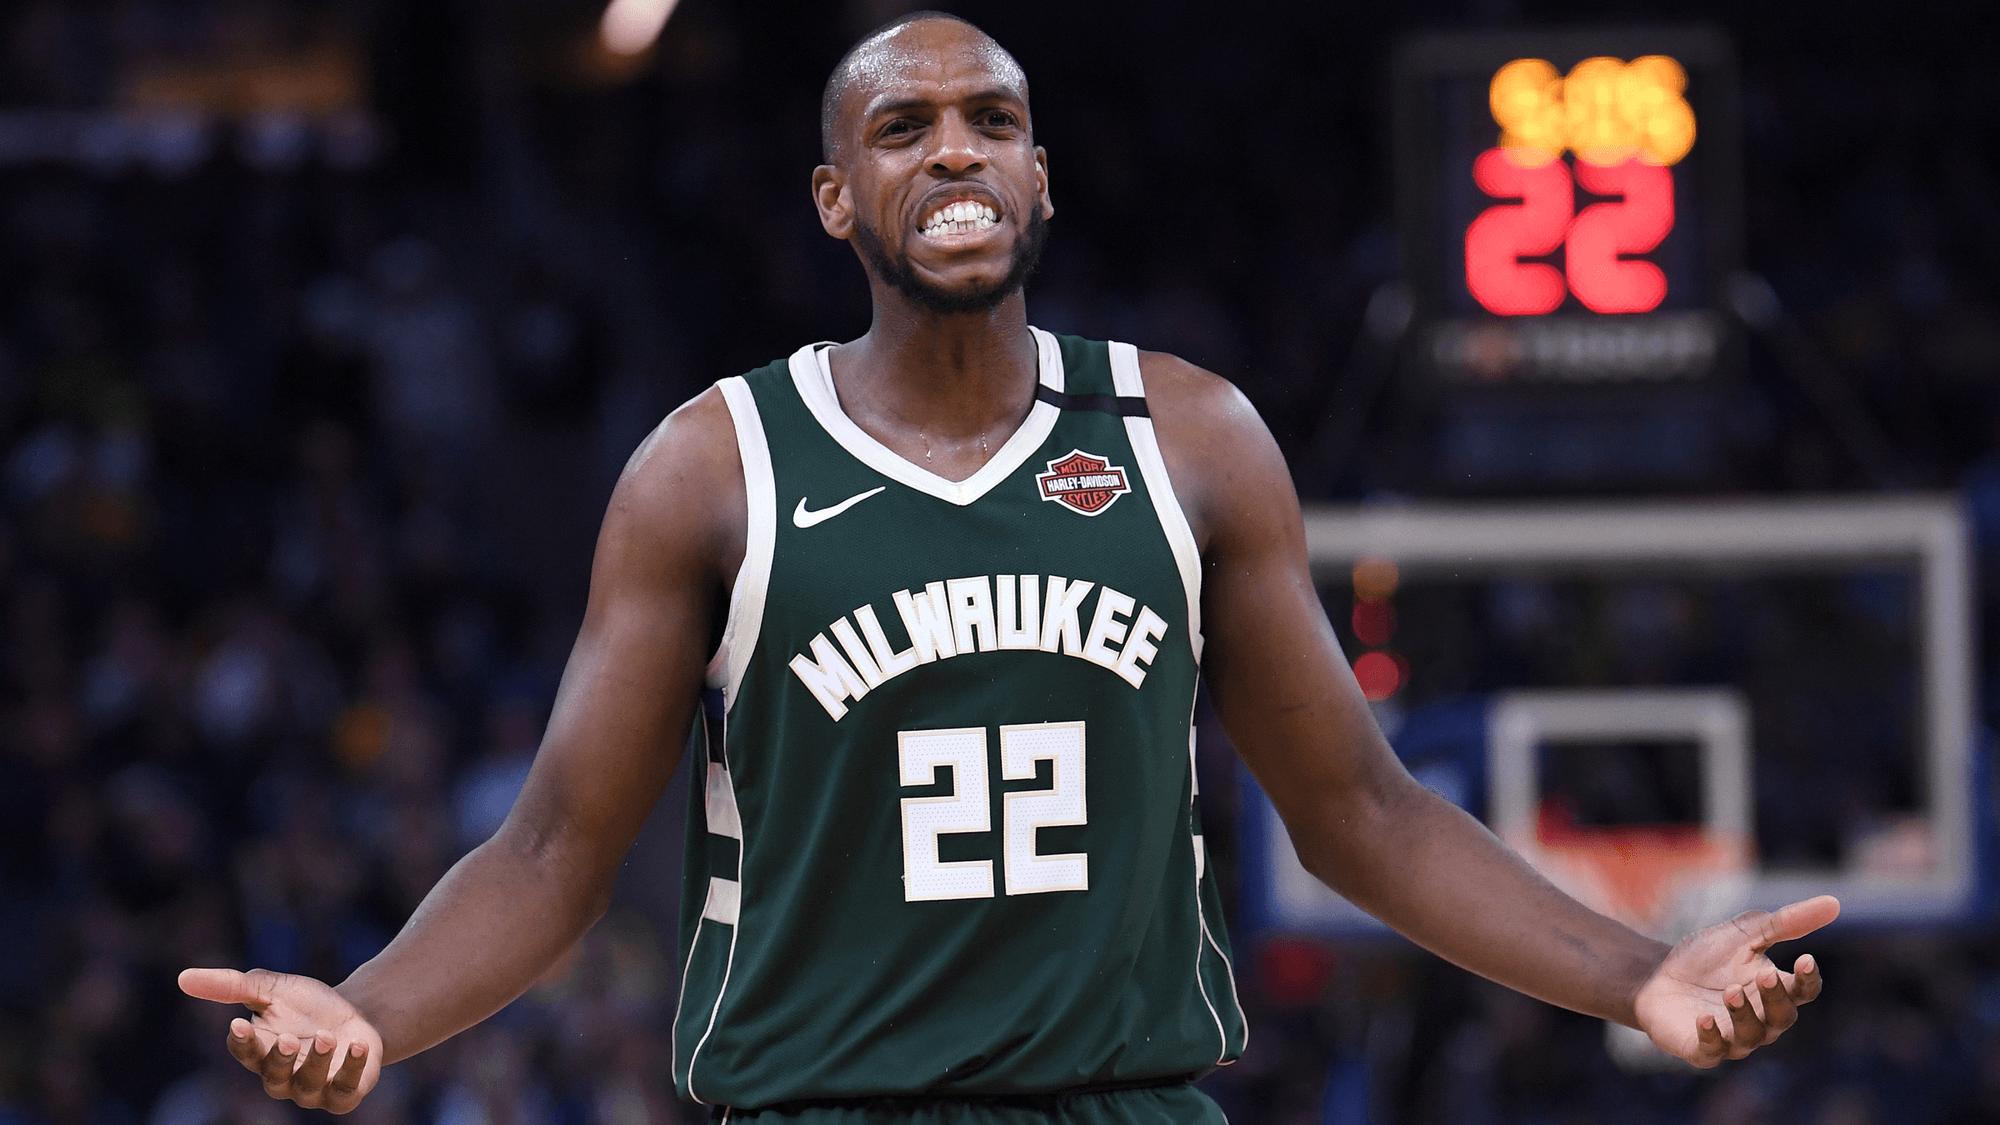 Nets vs Bucks Game 3 Betting Preview: How Will the Desperate Bucks Respond in Milwaukee?